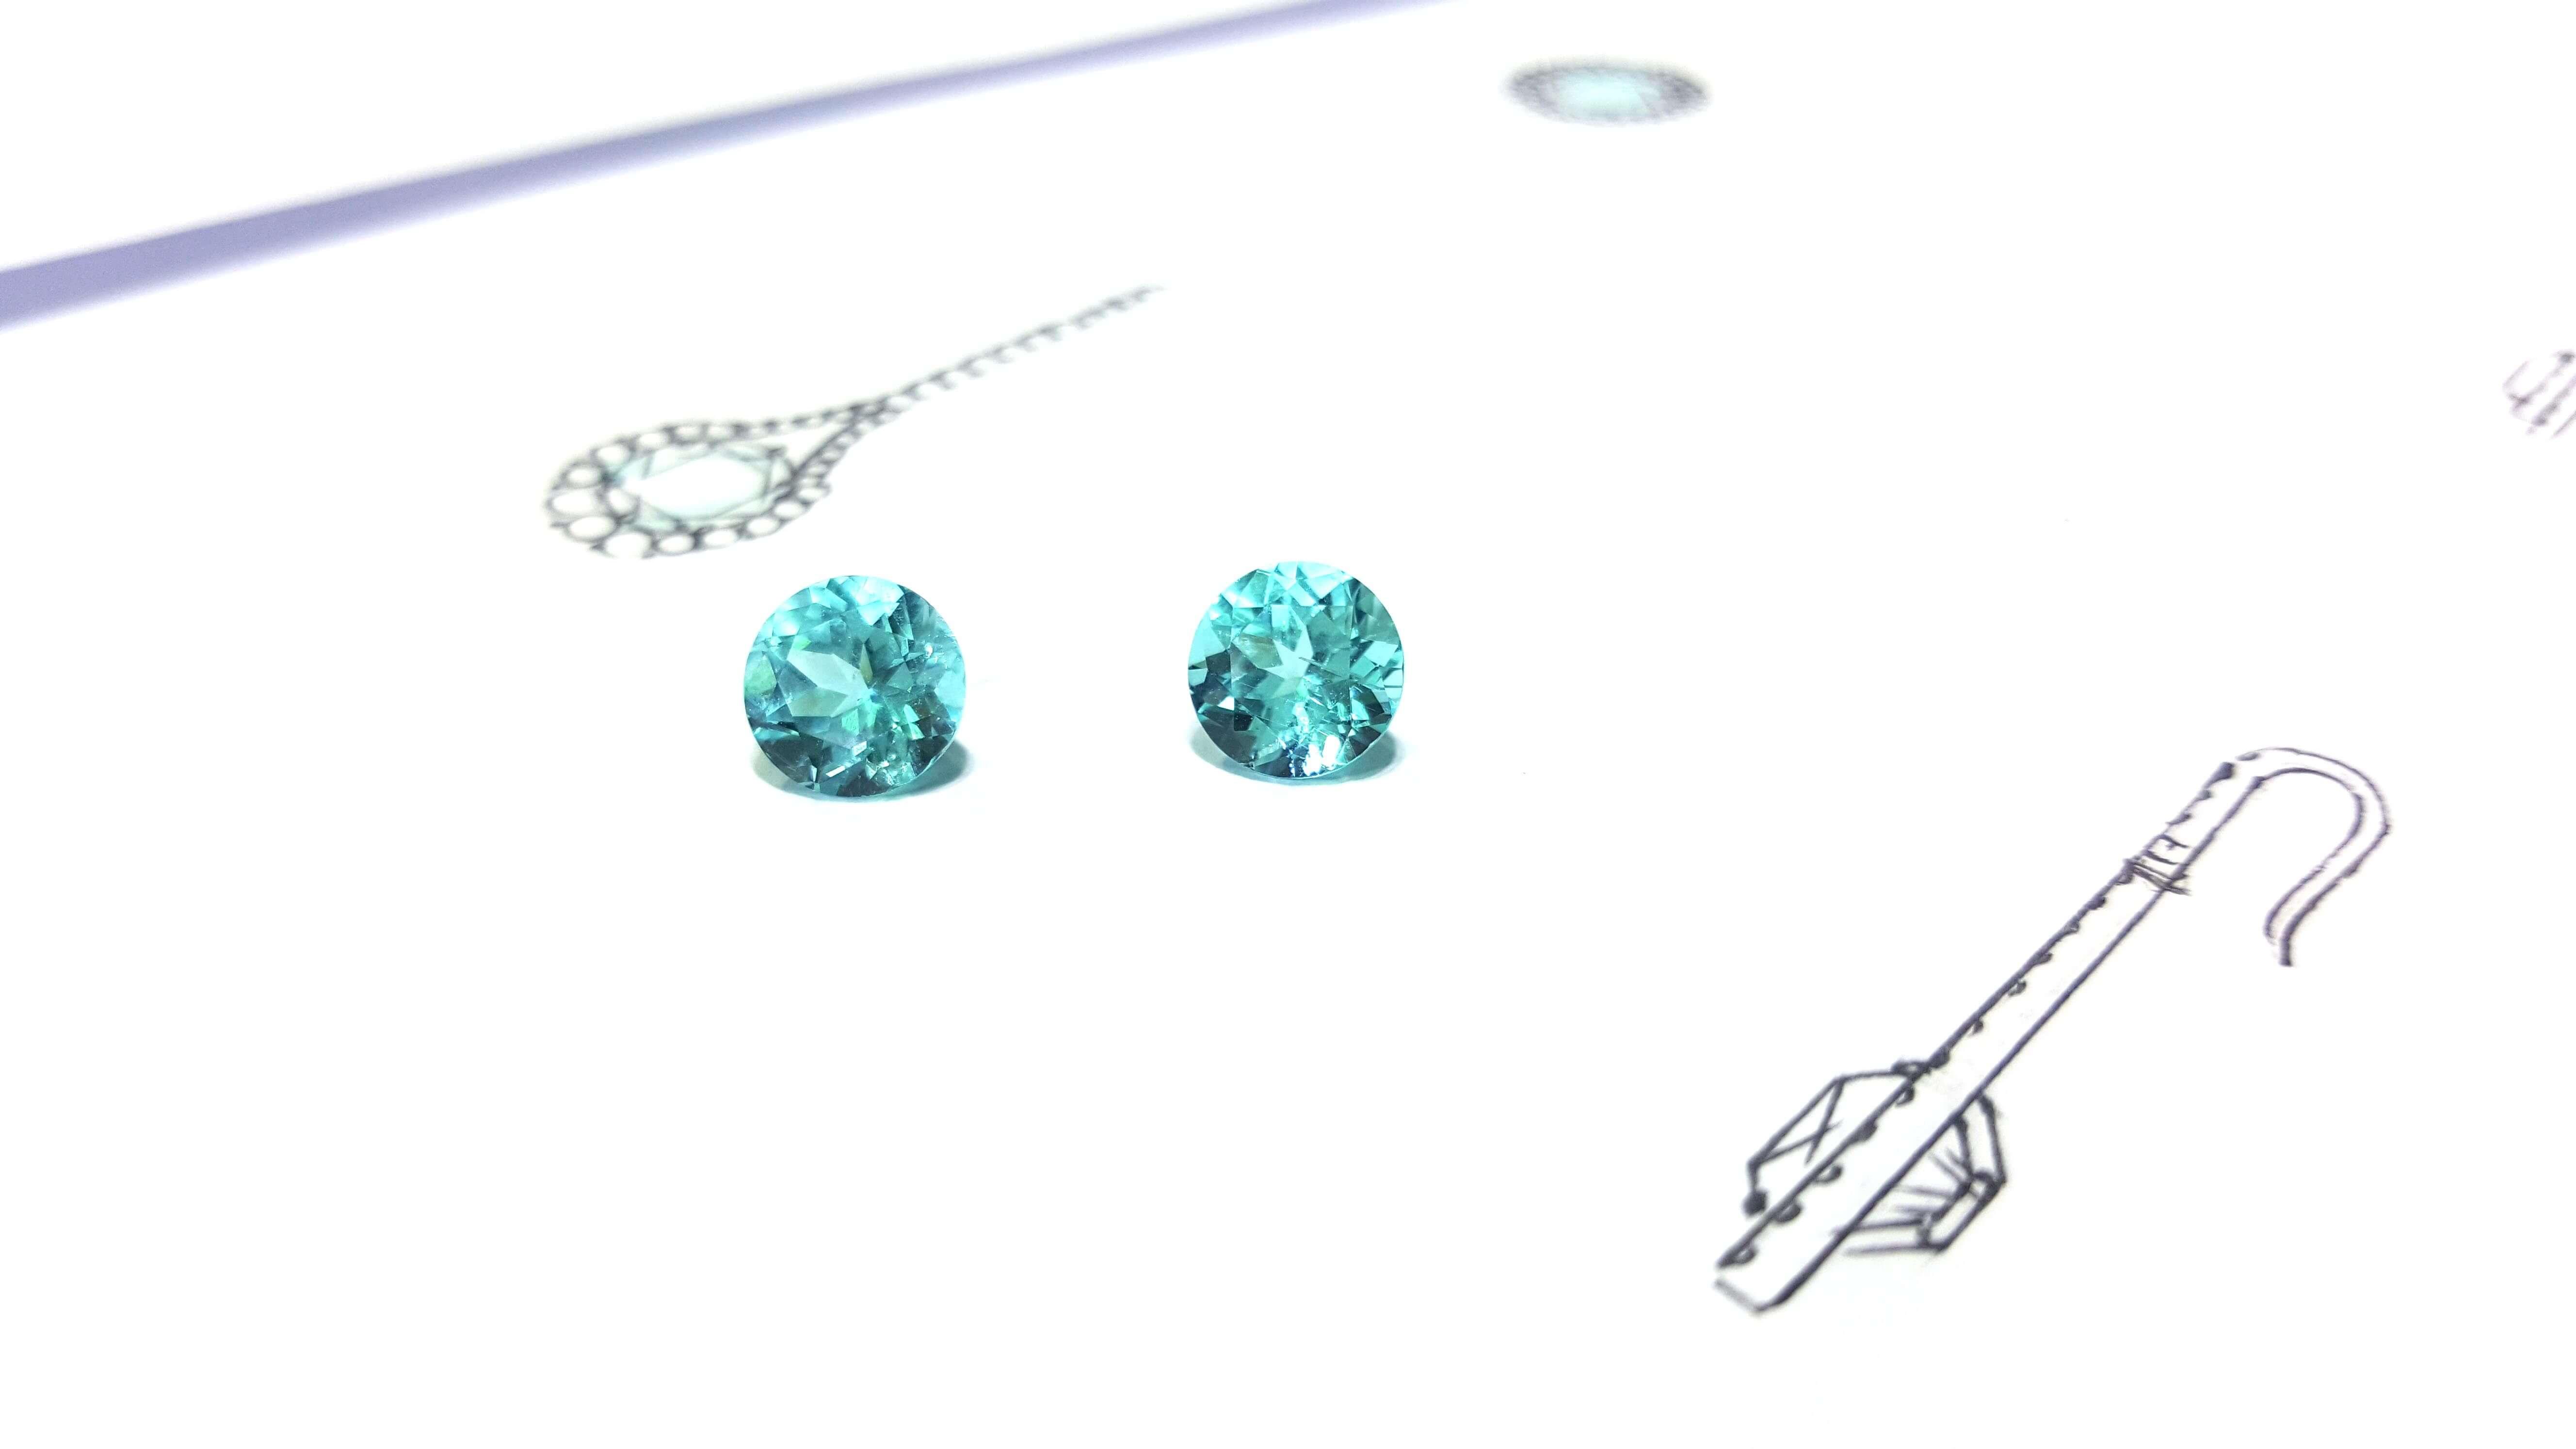 Custom made Paraiba Earring - unique fine jewellery with Paraiba Tourmaline | Local Singapore Customised Jeweller